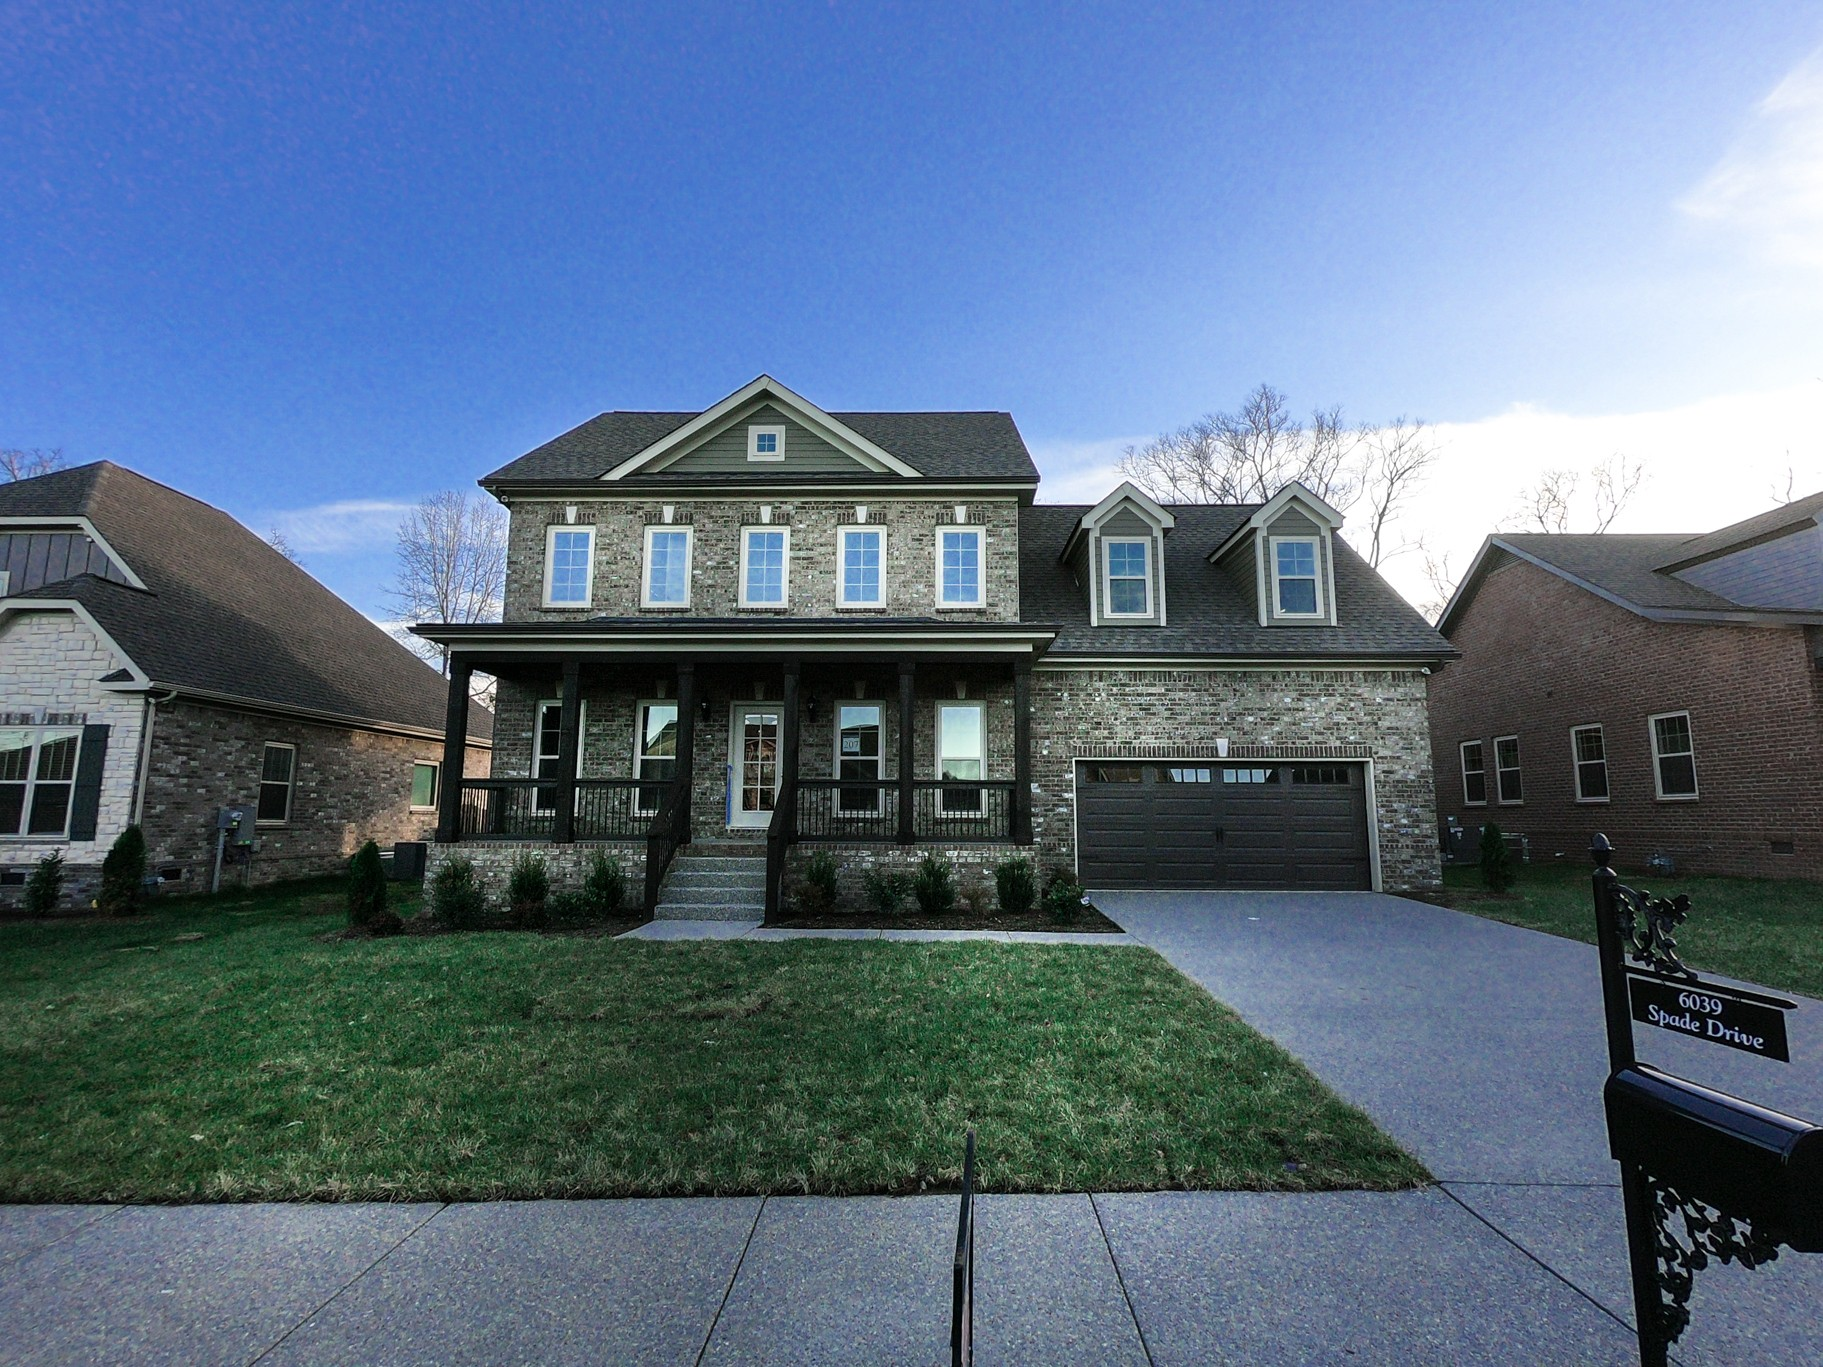 6039 Spade Dr. Lot# 207, Spring Hill, TN 37174 - Spring Hill, TN real estate listing